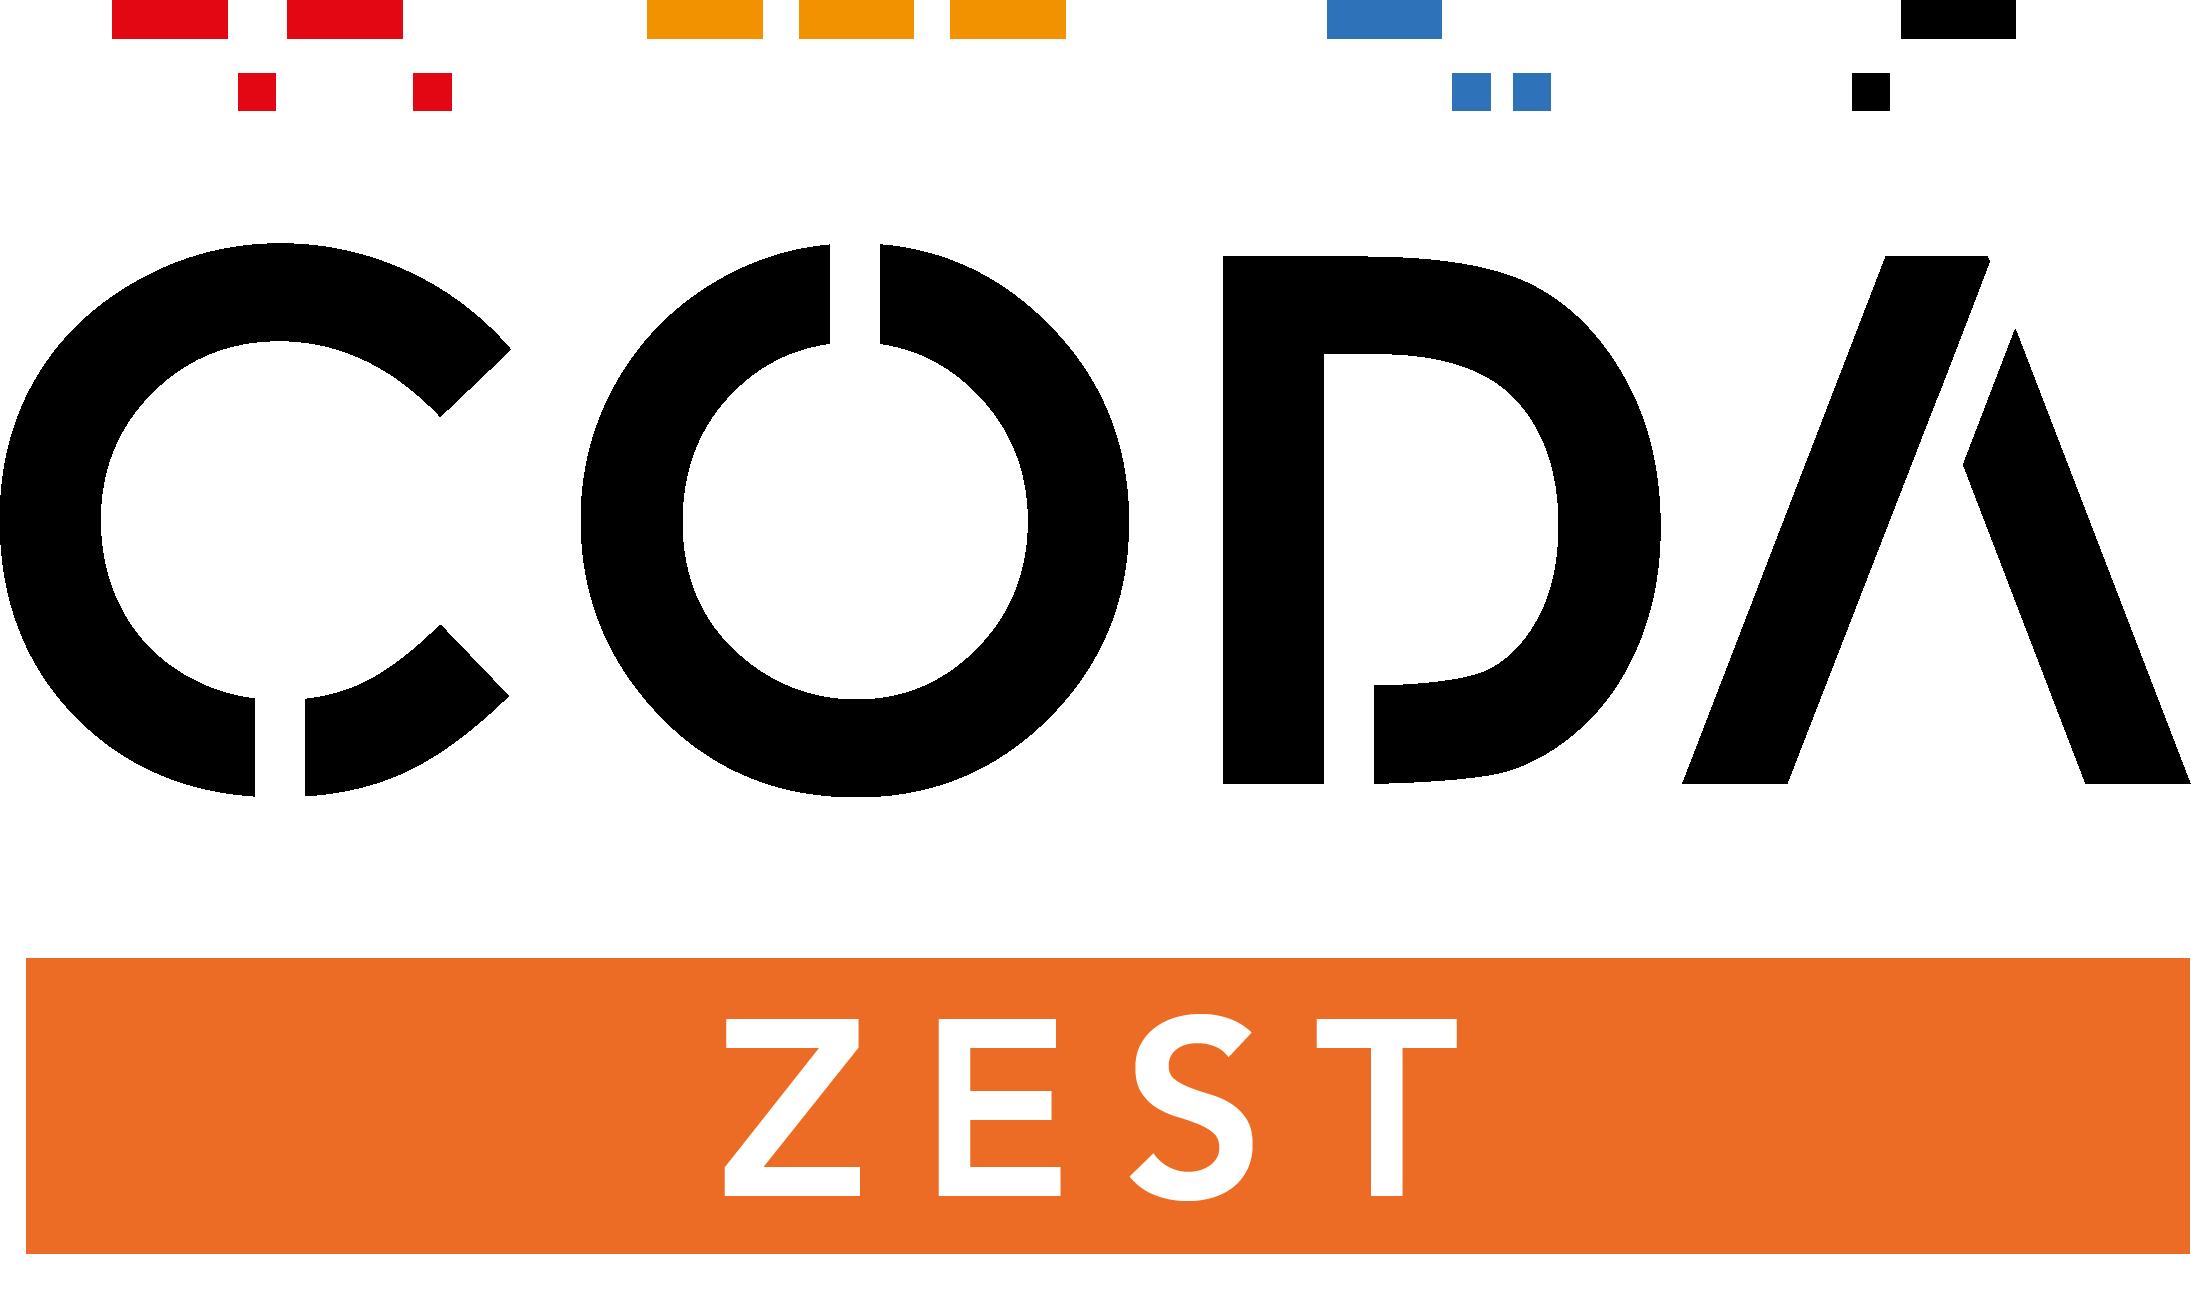 CODA_ZEST_10_INCH_WINDOWS_10_TABLET_WITH_KEYBOARD